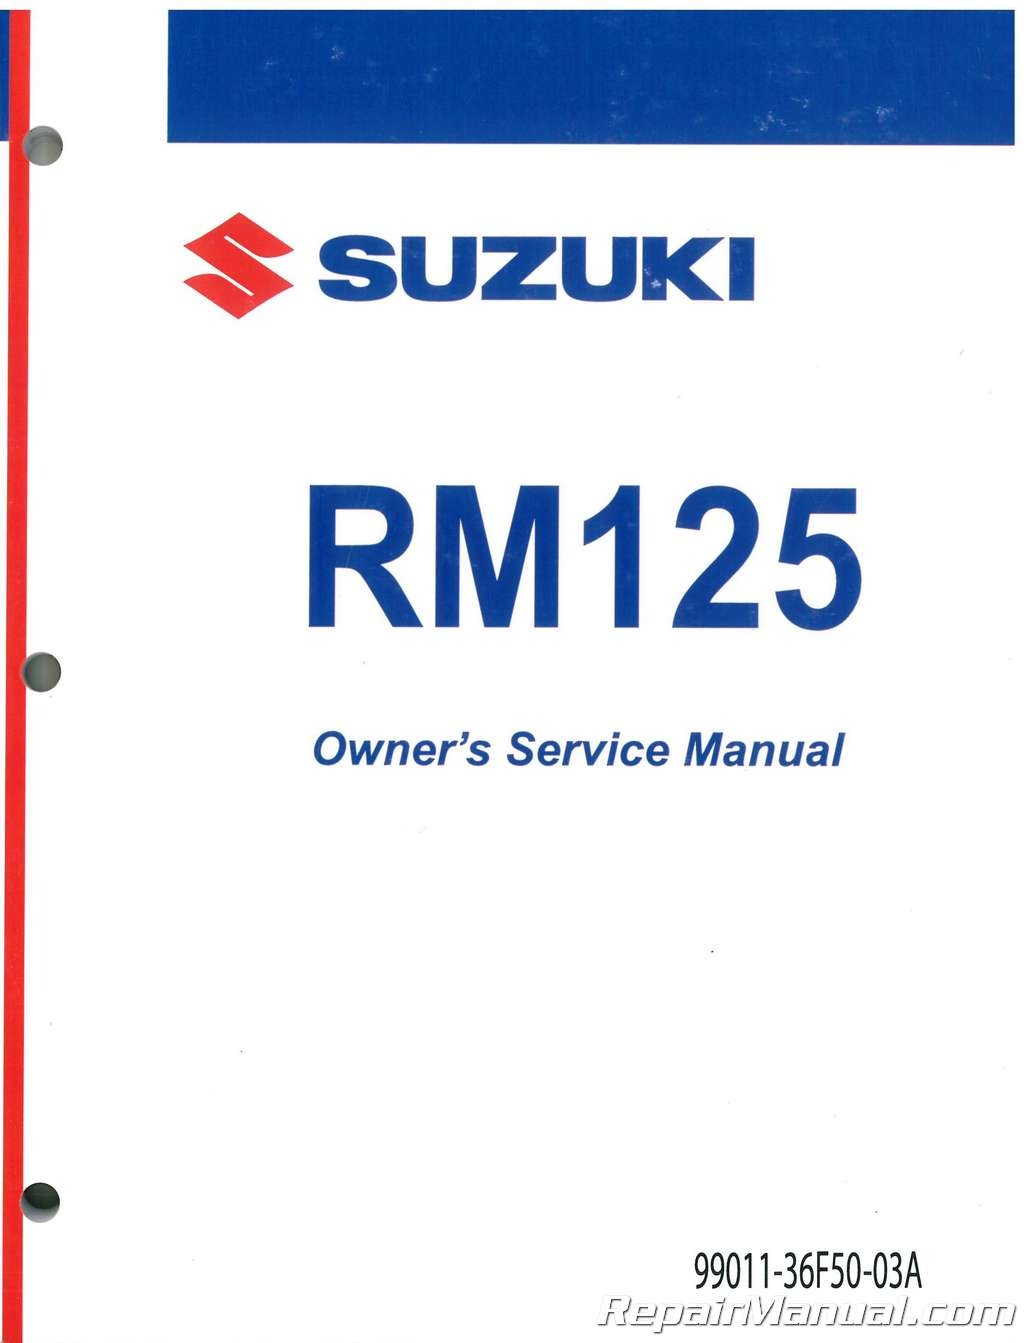 2001 suzuki rm125k1 motorcycle service manual 99011 36f50 03a ebay rh ebay co uk 2006 RM 125 2007 RM 125